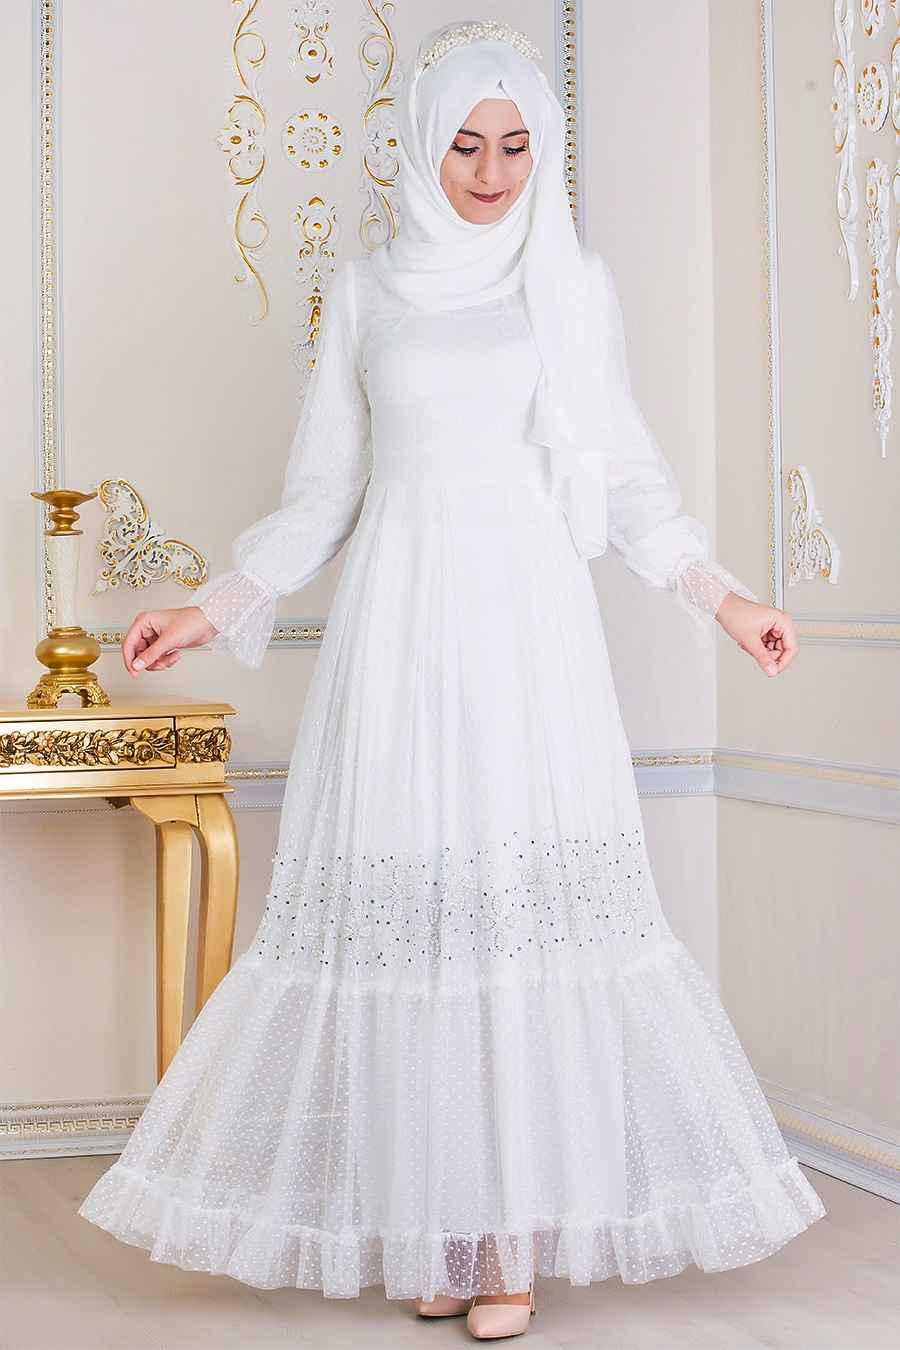 Feiza Collection Tesettür Tül Elbise Modelleri